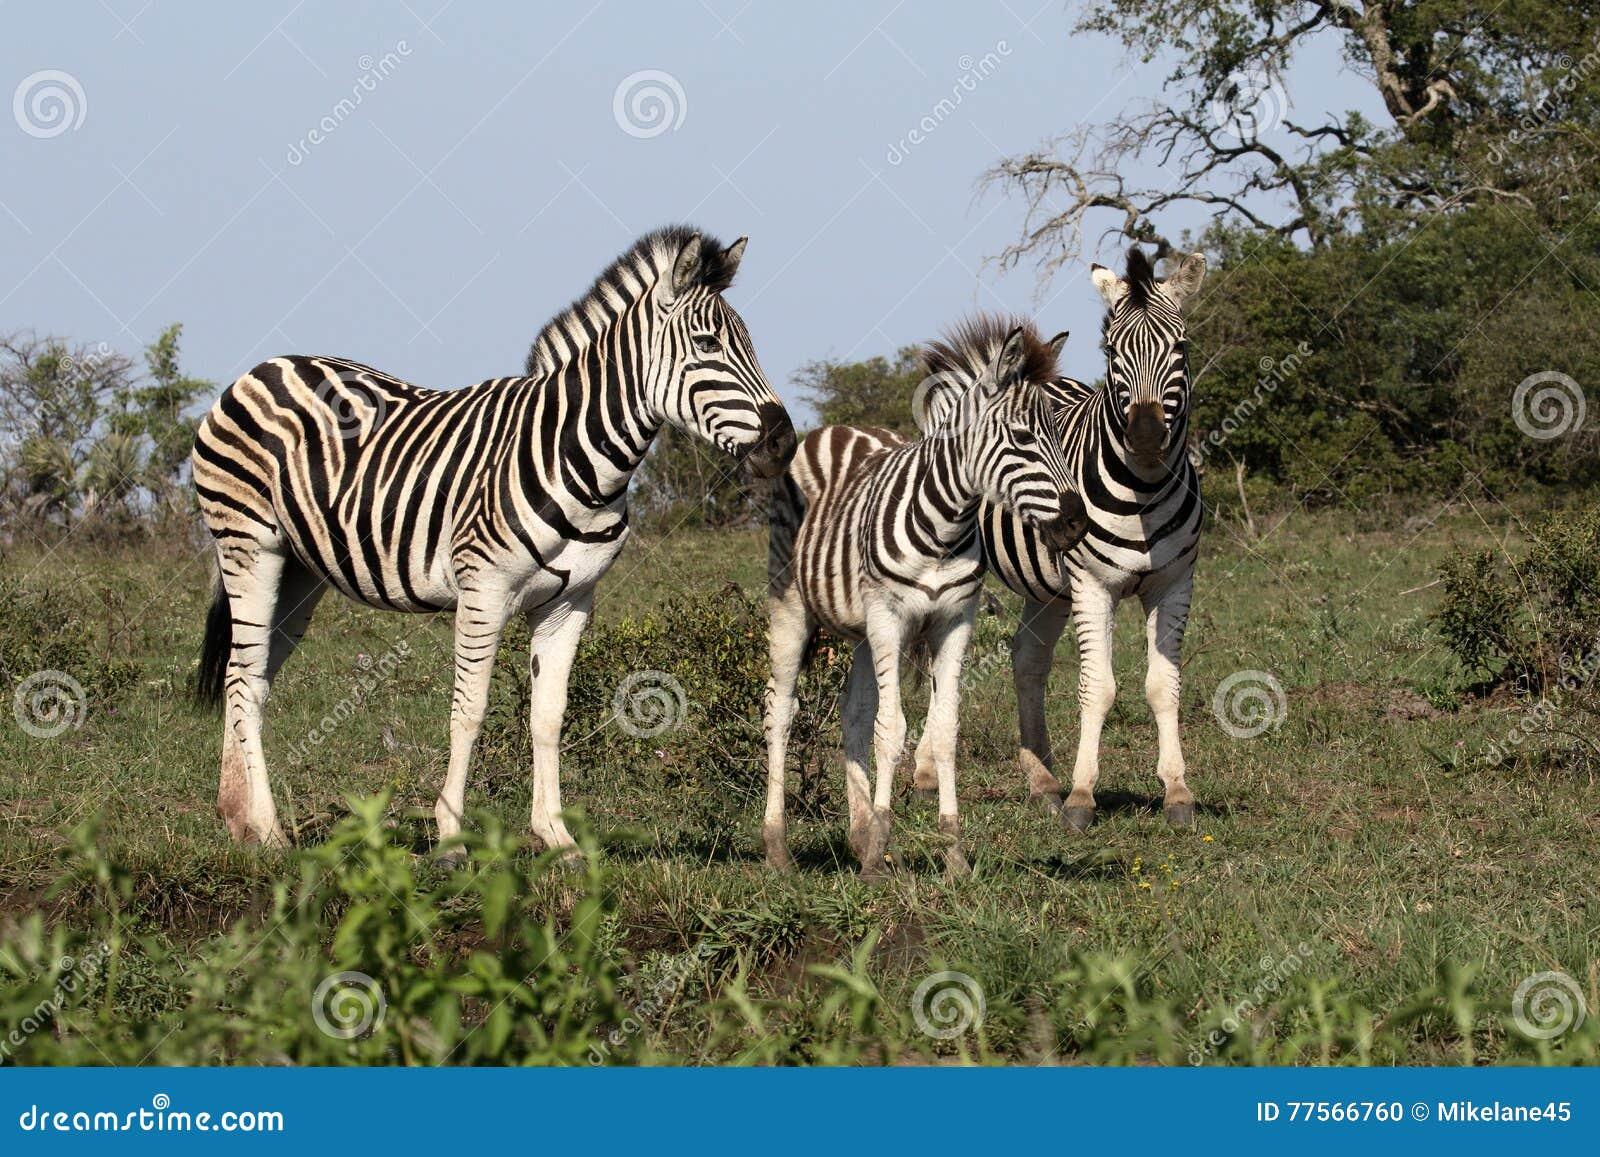 Równiny zebra, Pospolita zebra lub Burchells zebra, Equus kwaga